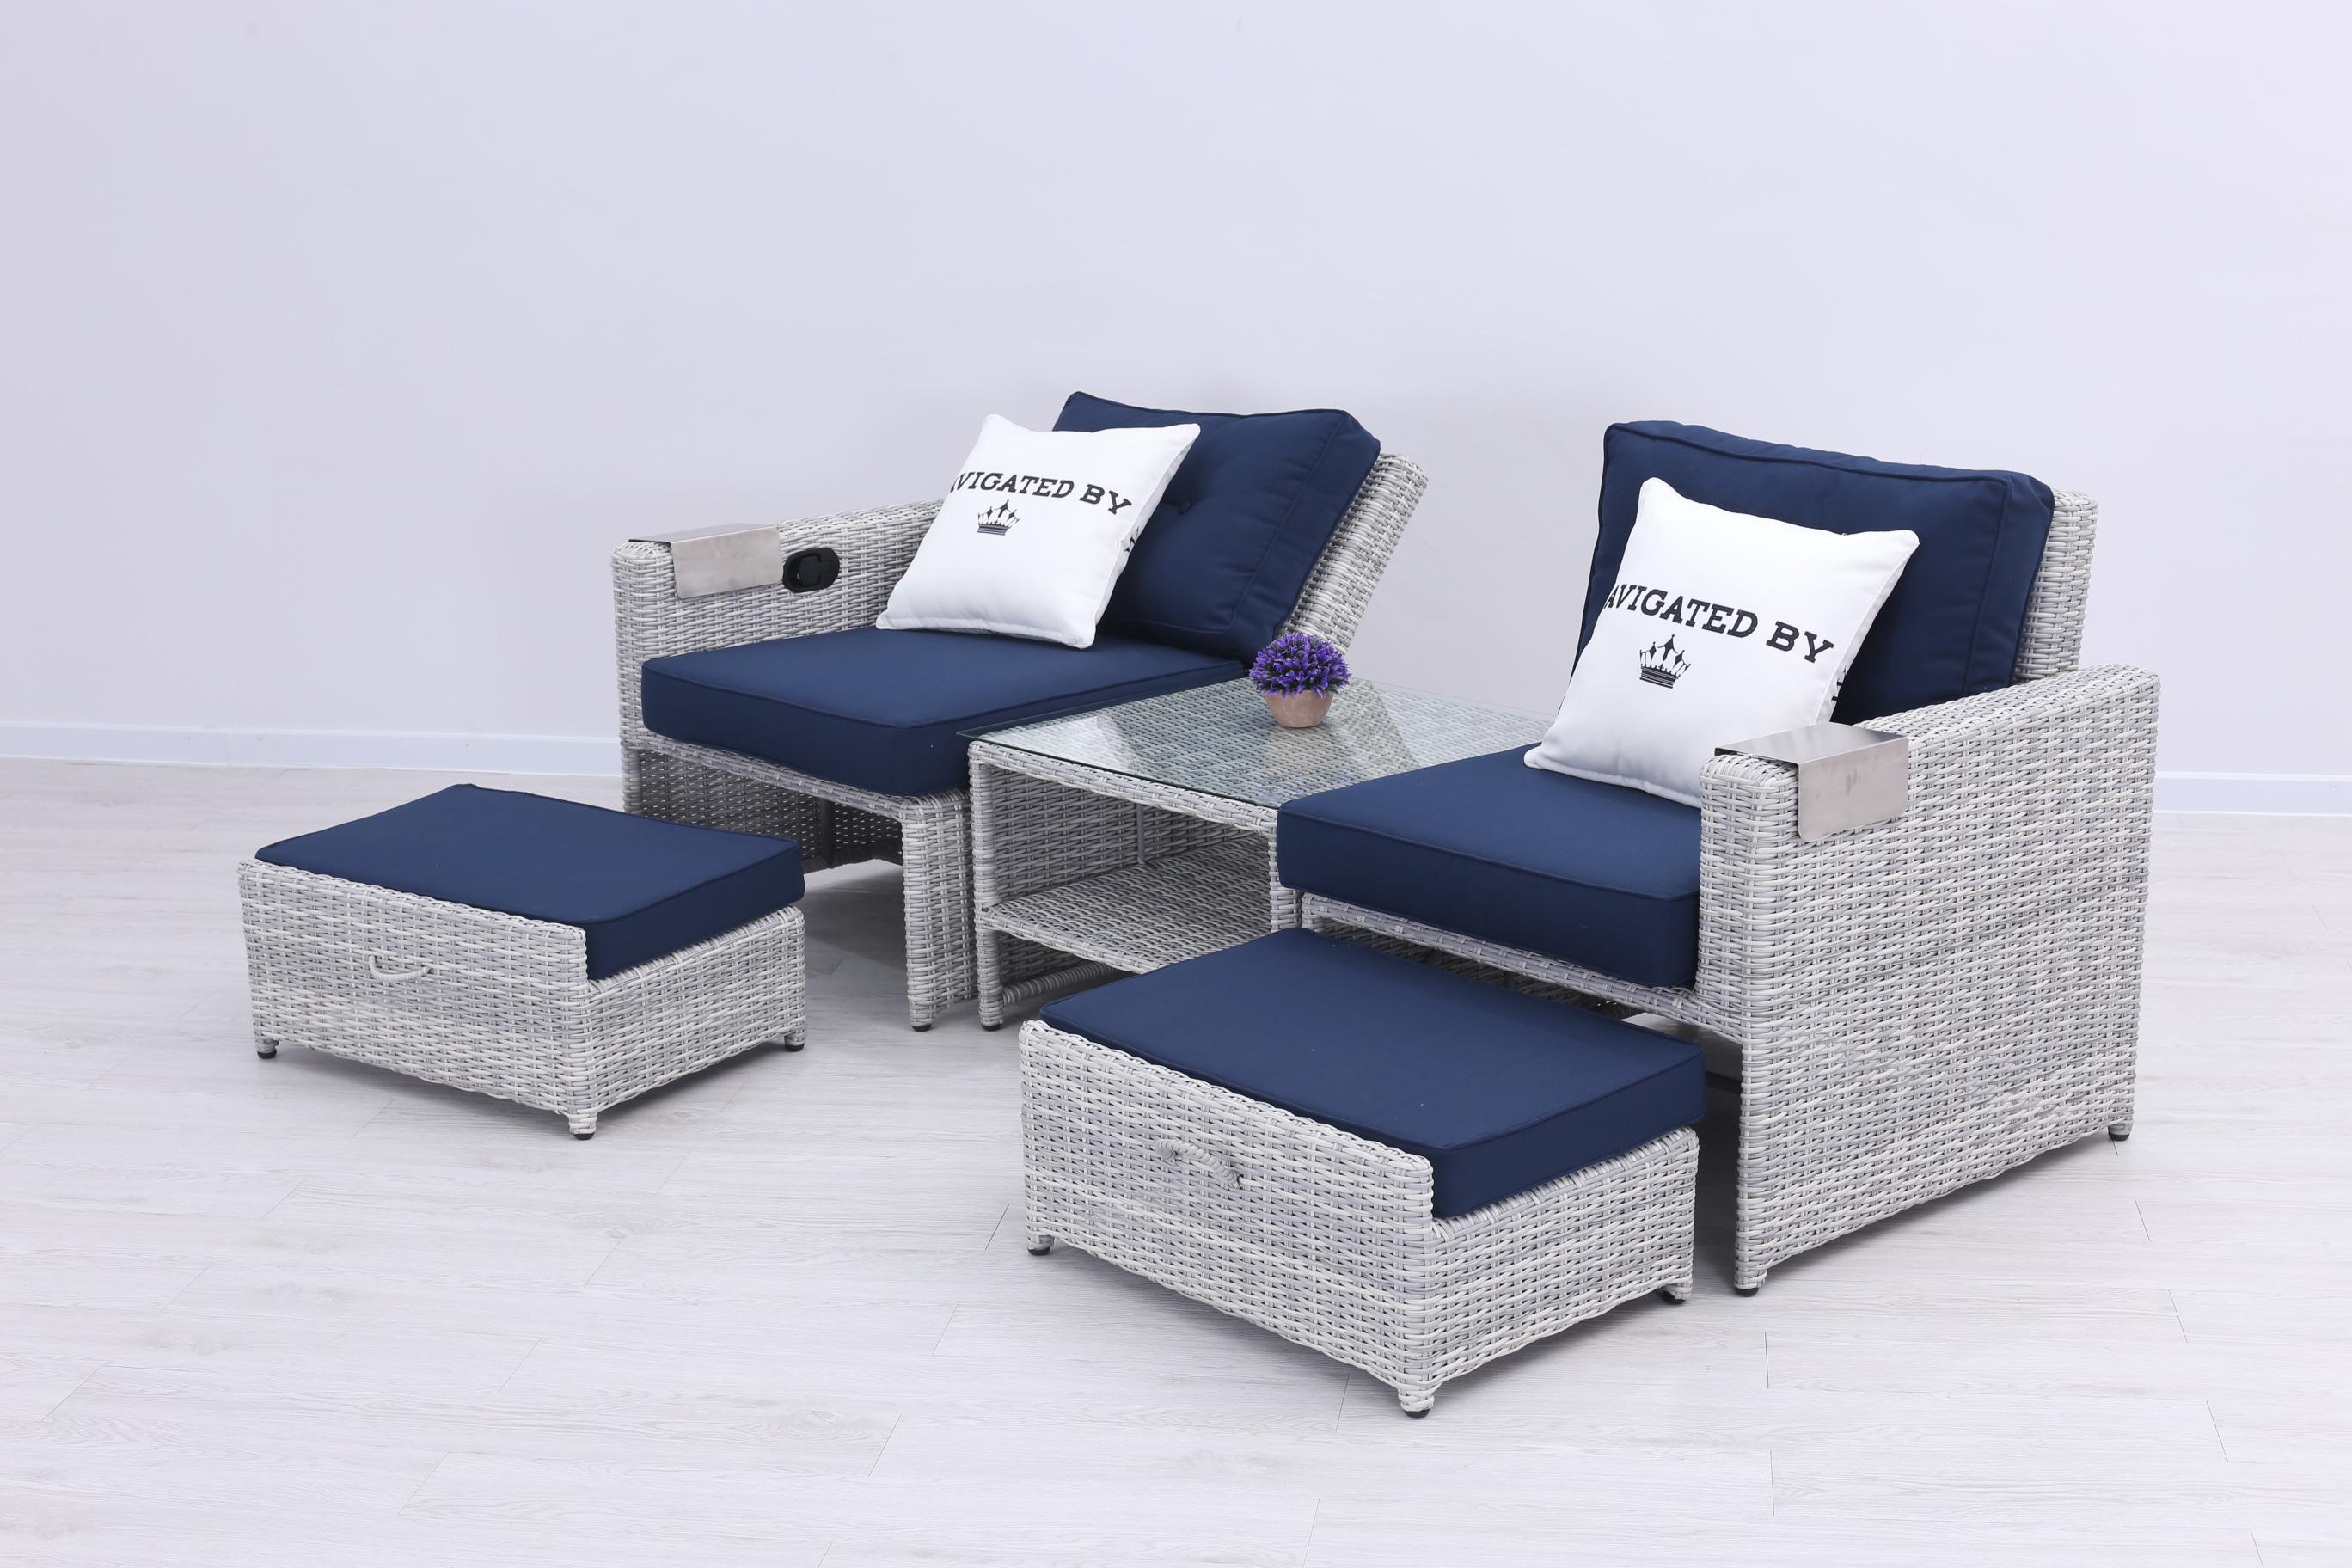 seko polyrattan duo daybed 2 sitzer lounge grau lounge m bel garten gartenm bel. Black Bedroom Furniture Sets. Home Design Ideas